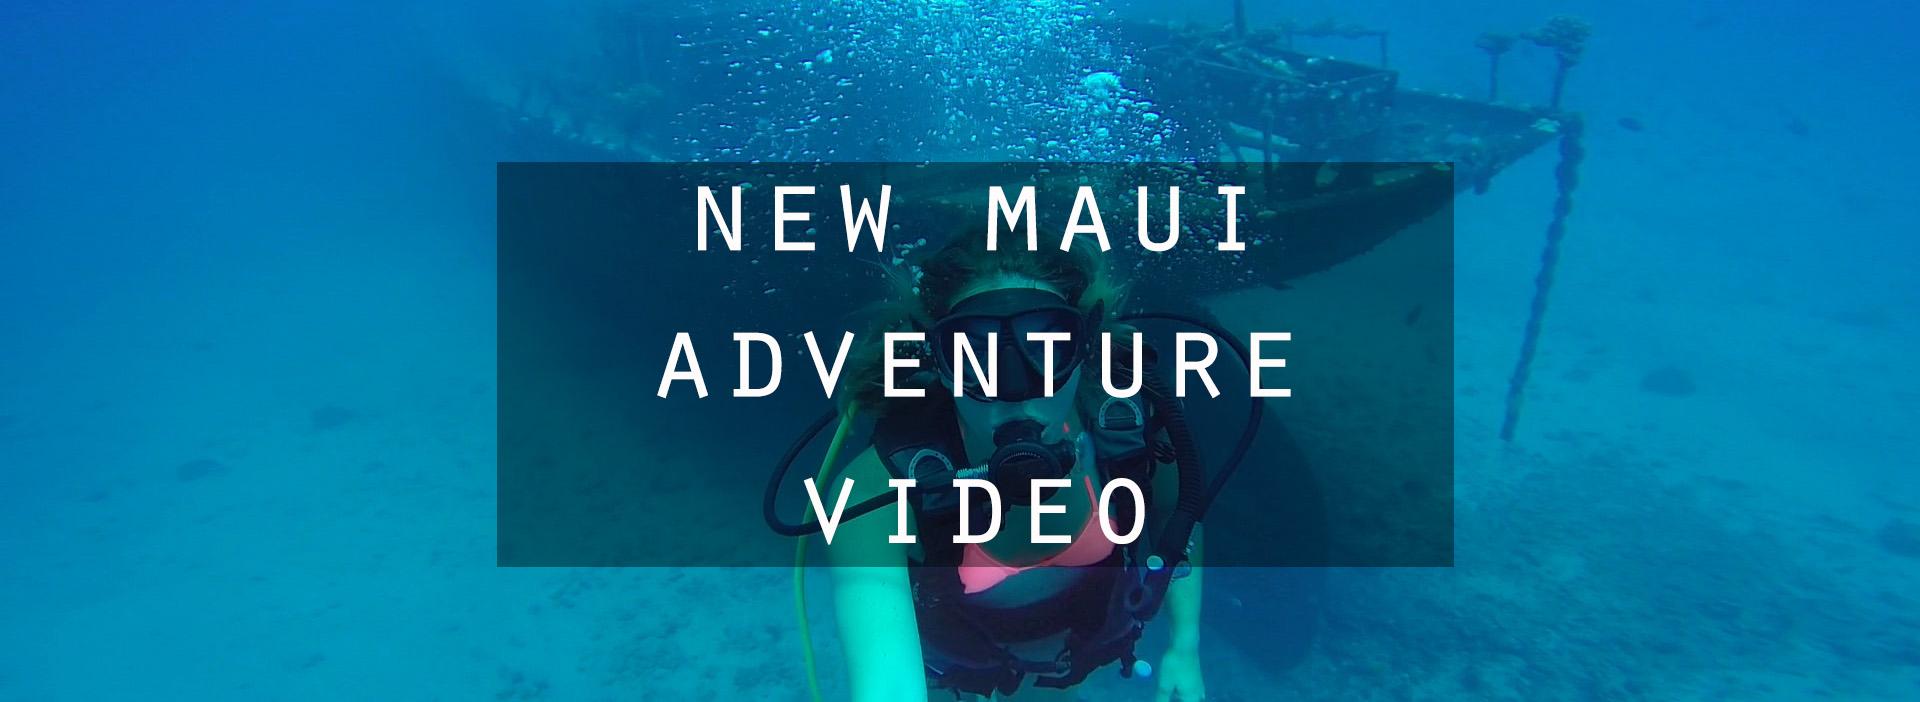 New Maui Adventure Video!